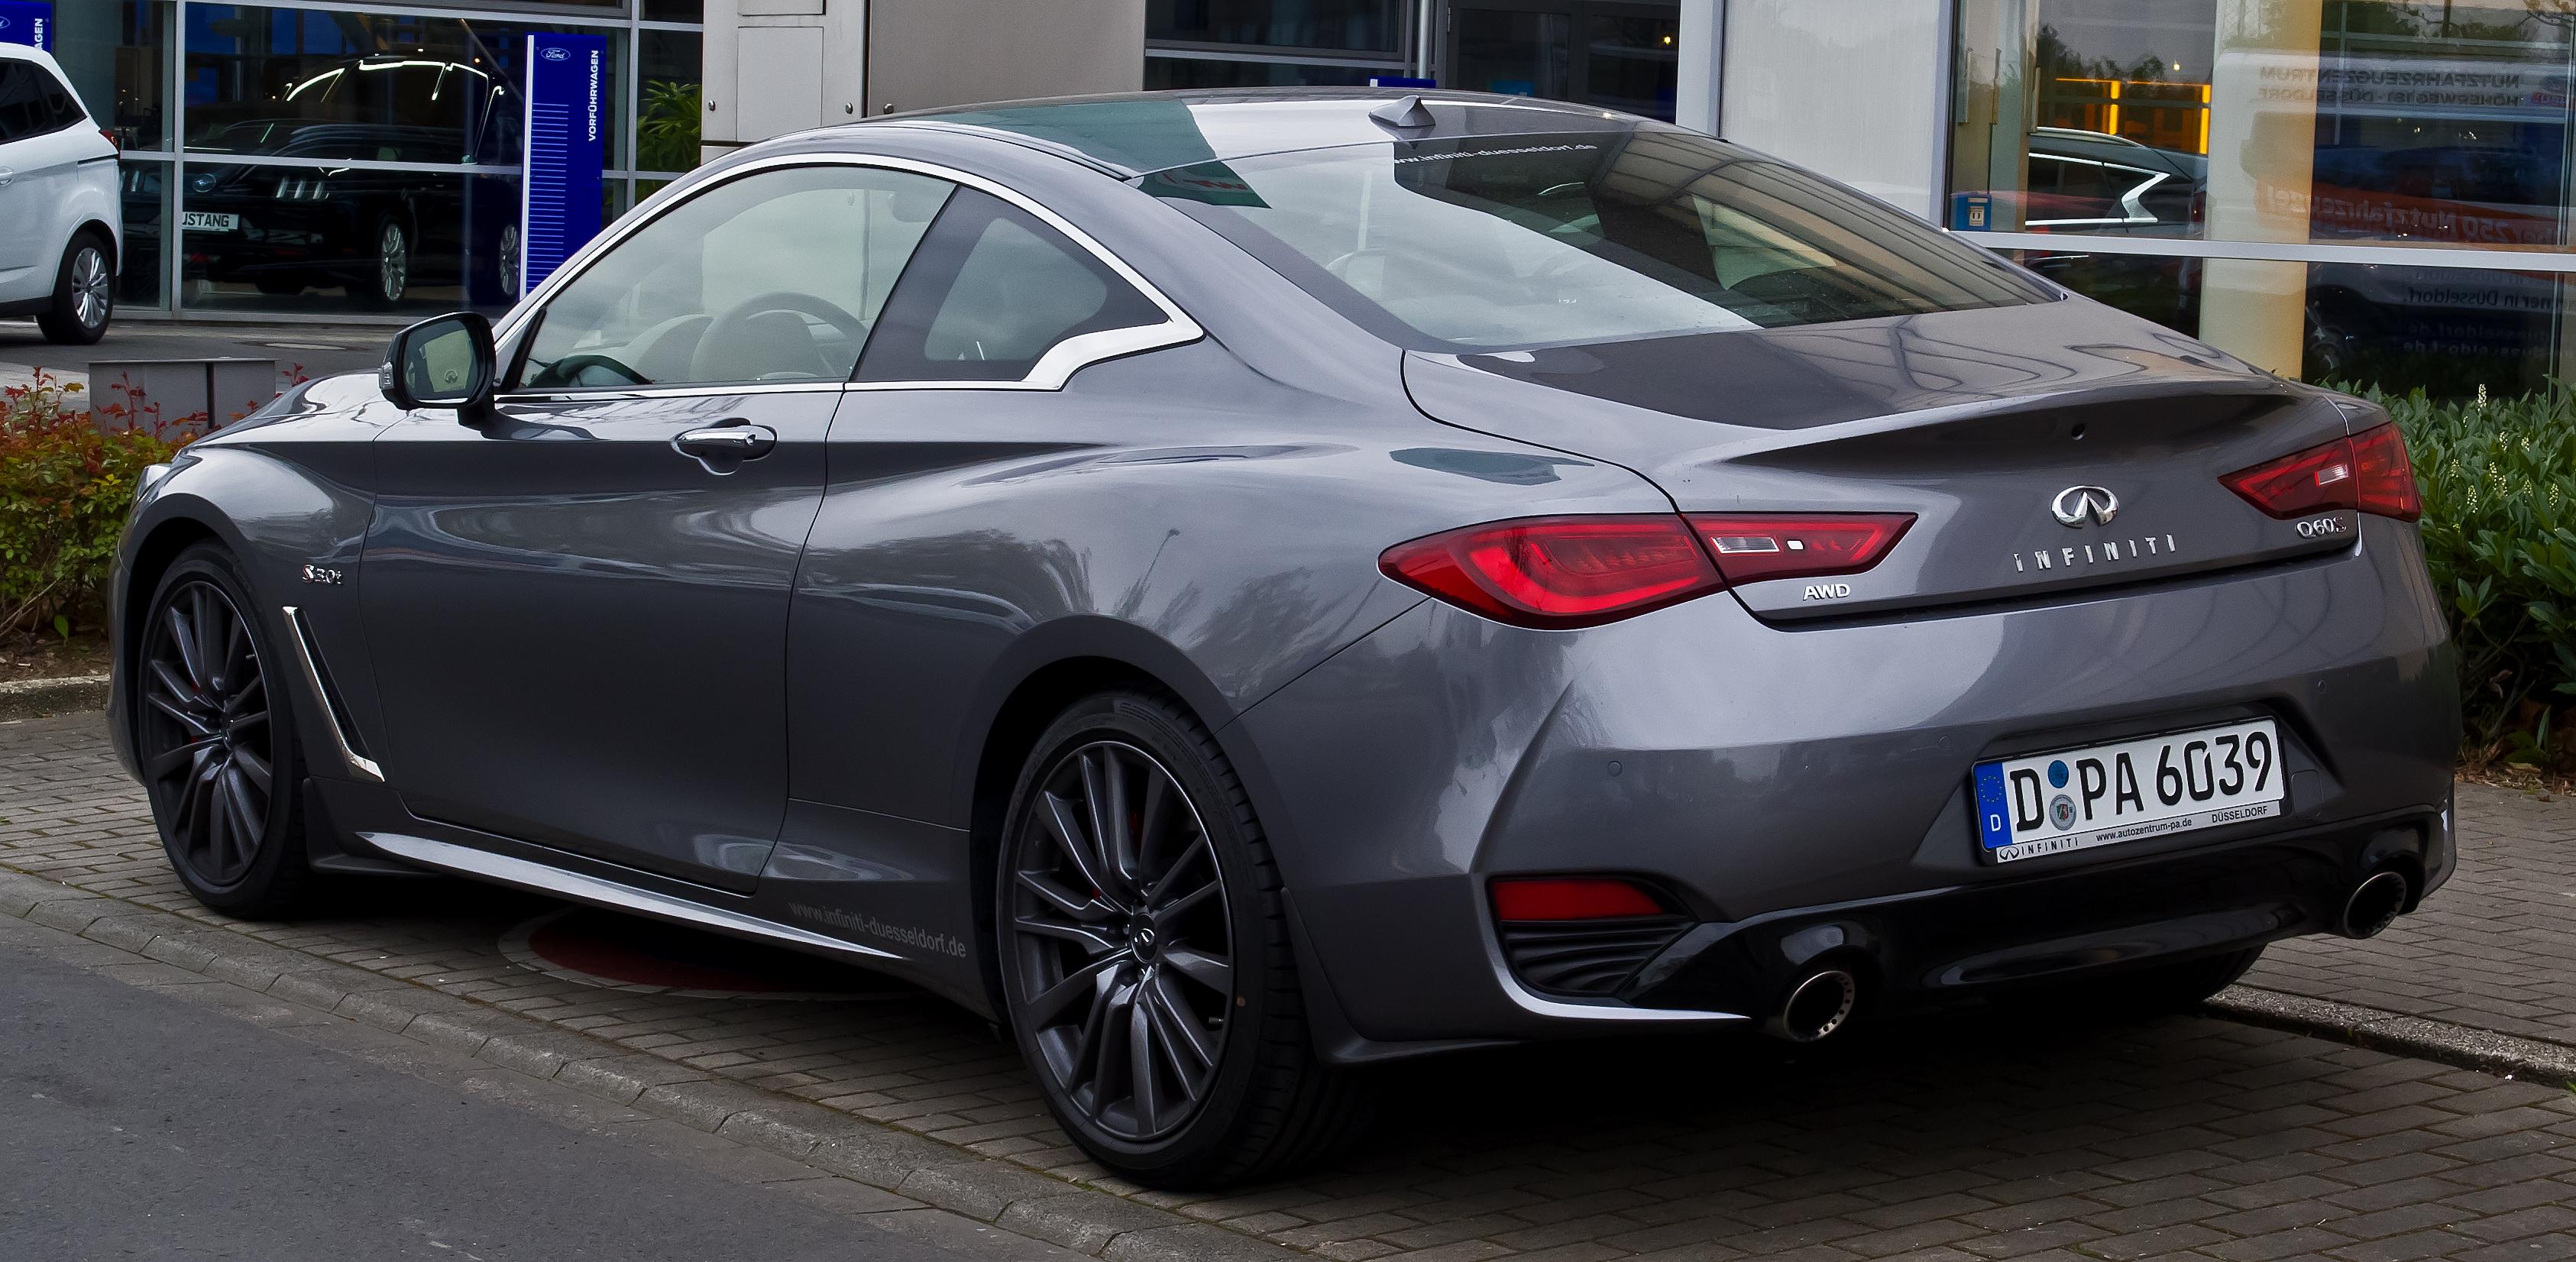 Autos.ca Forum: Test Drive: 2018 Infiniti Q50 3.0t Sport